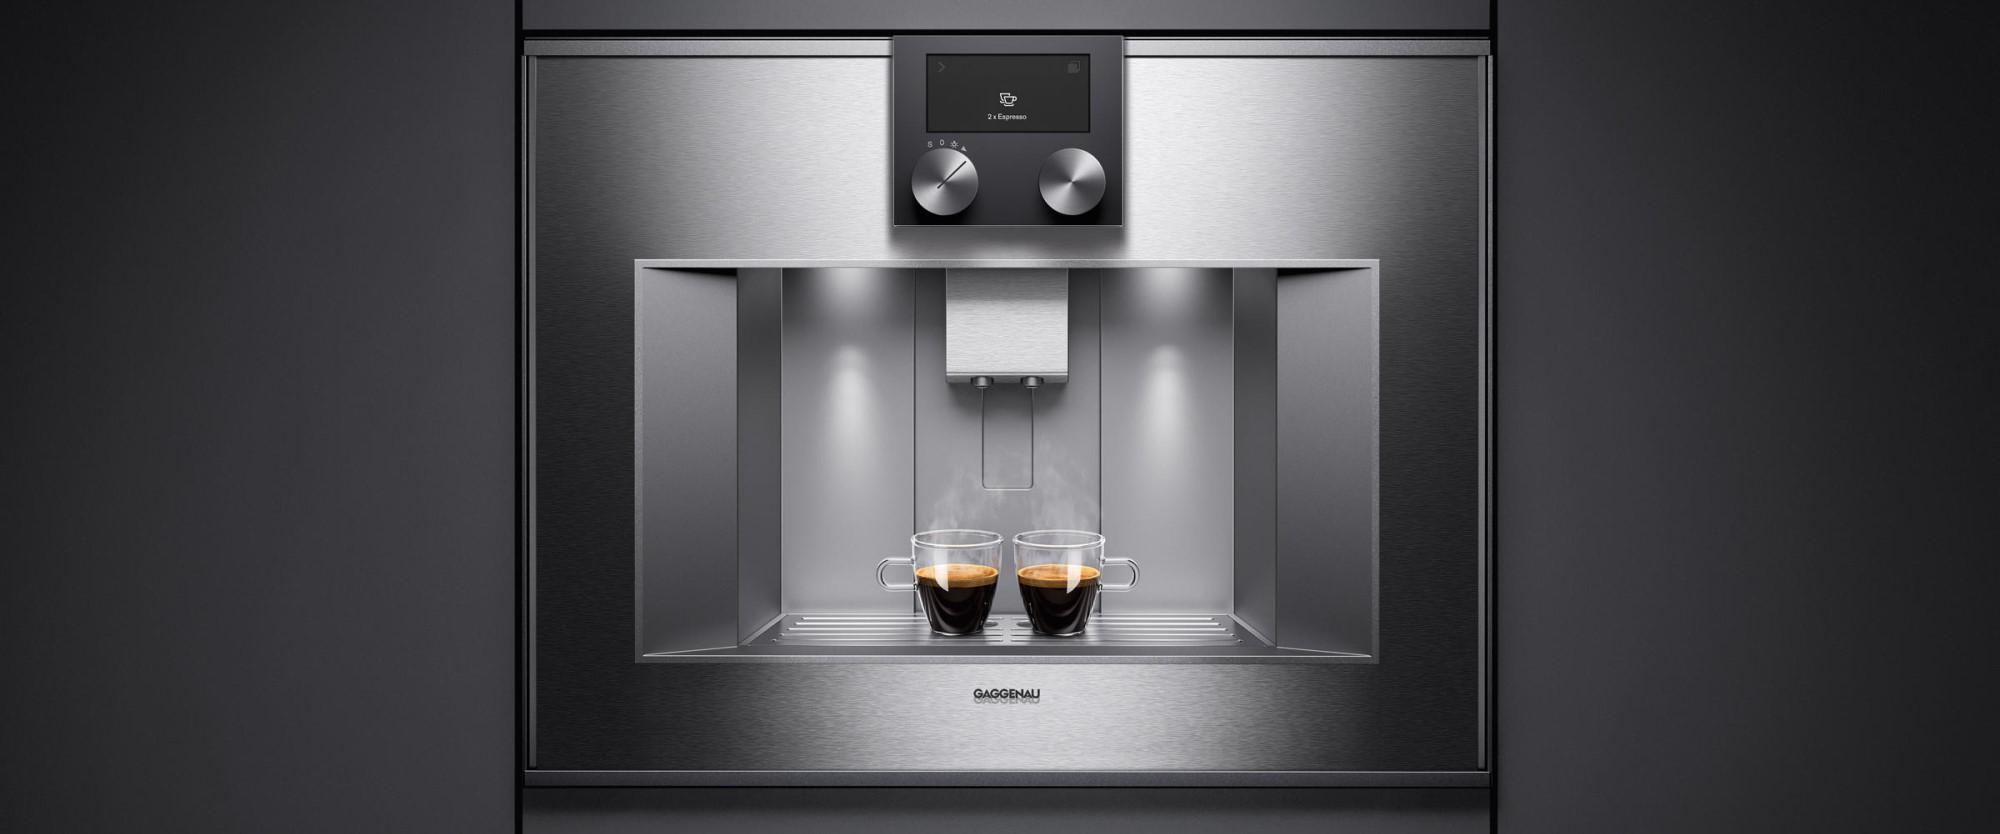 gaggenau-coffee-machine